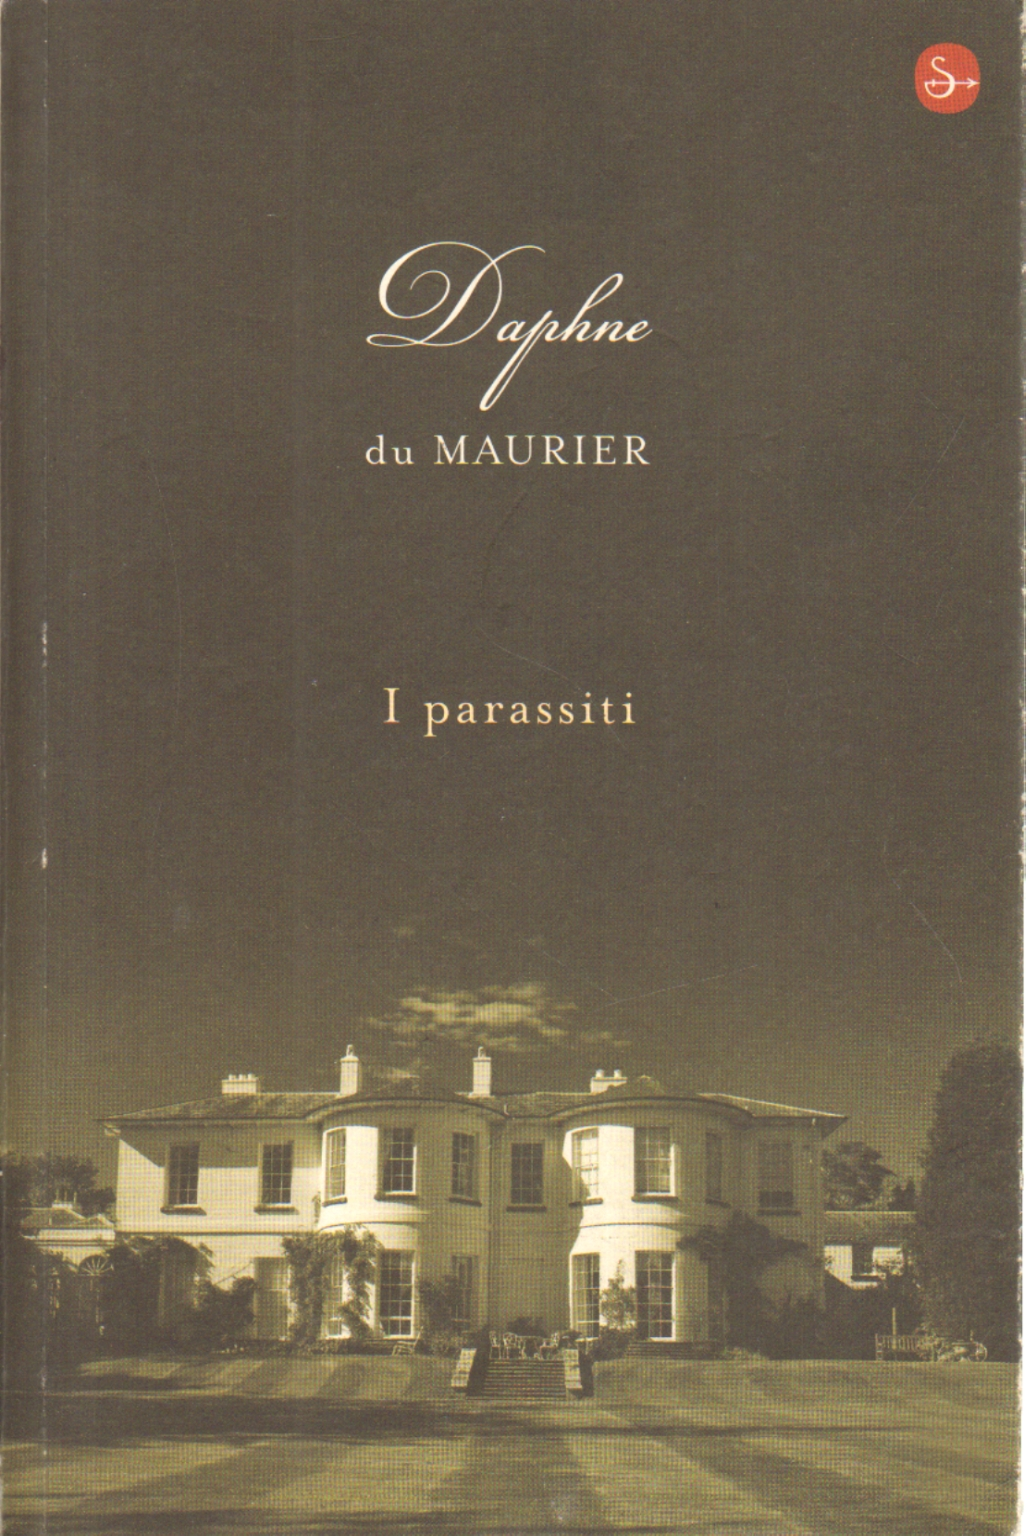 a Daphne du maurier parazitái moly ultra parazitáktól